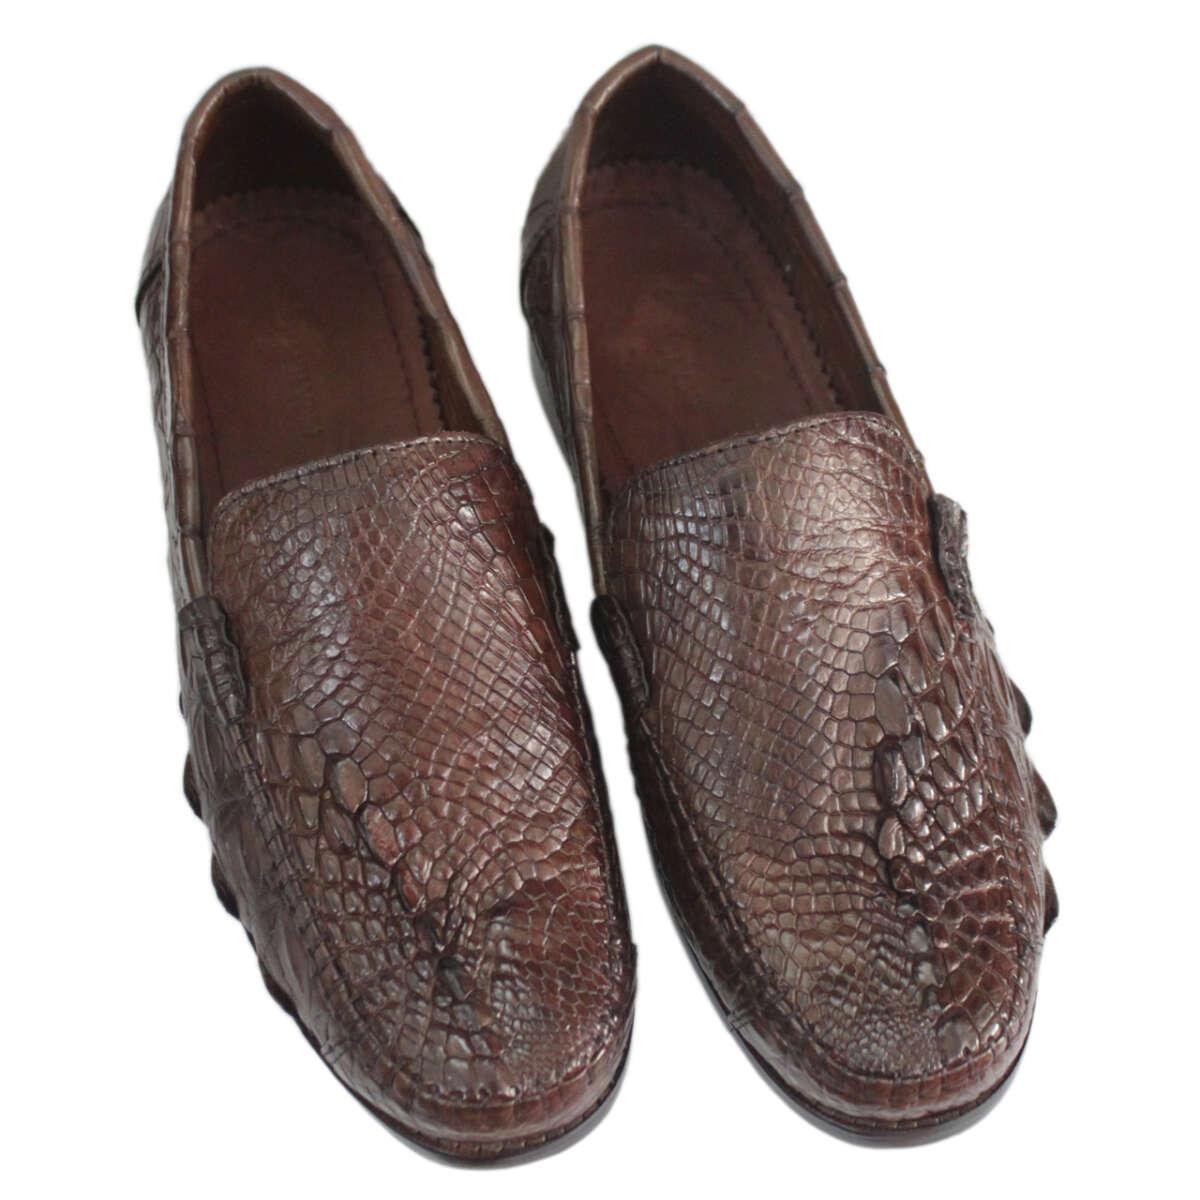 Giày lười nam da cá sấu S878a